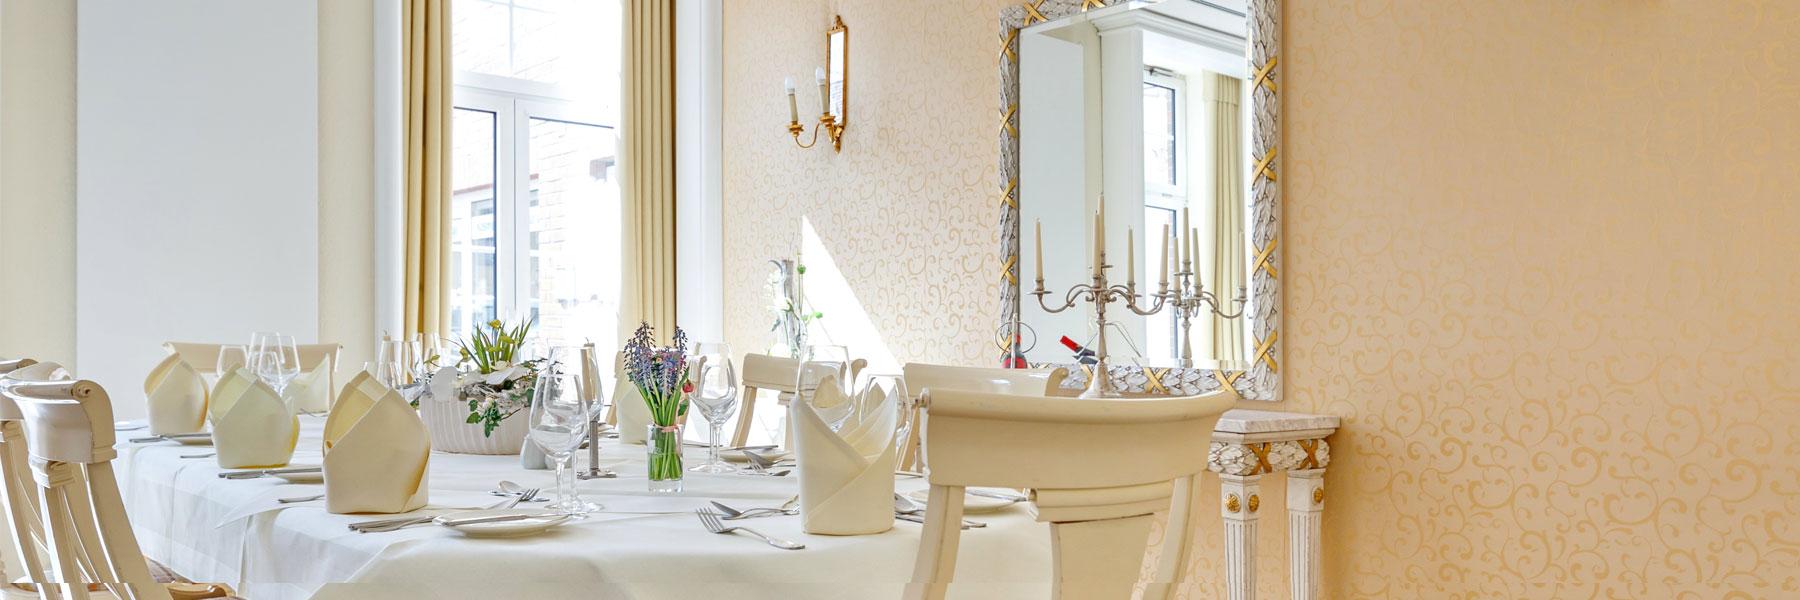 "Restaurant - Hotel ""Erbprinz"""